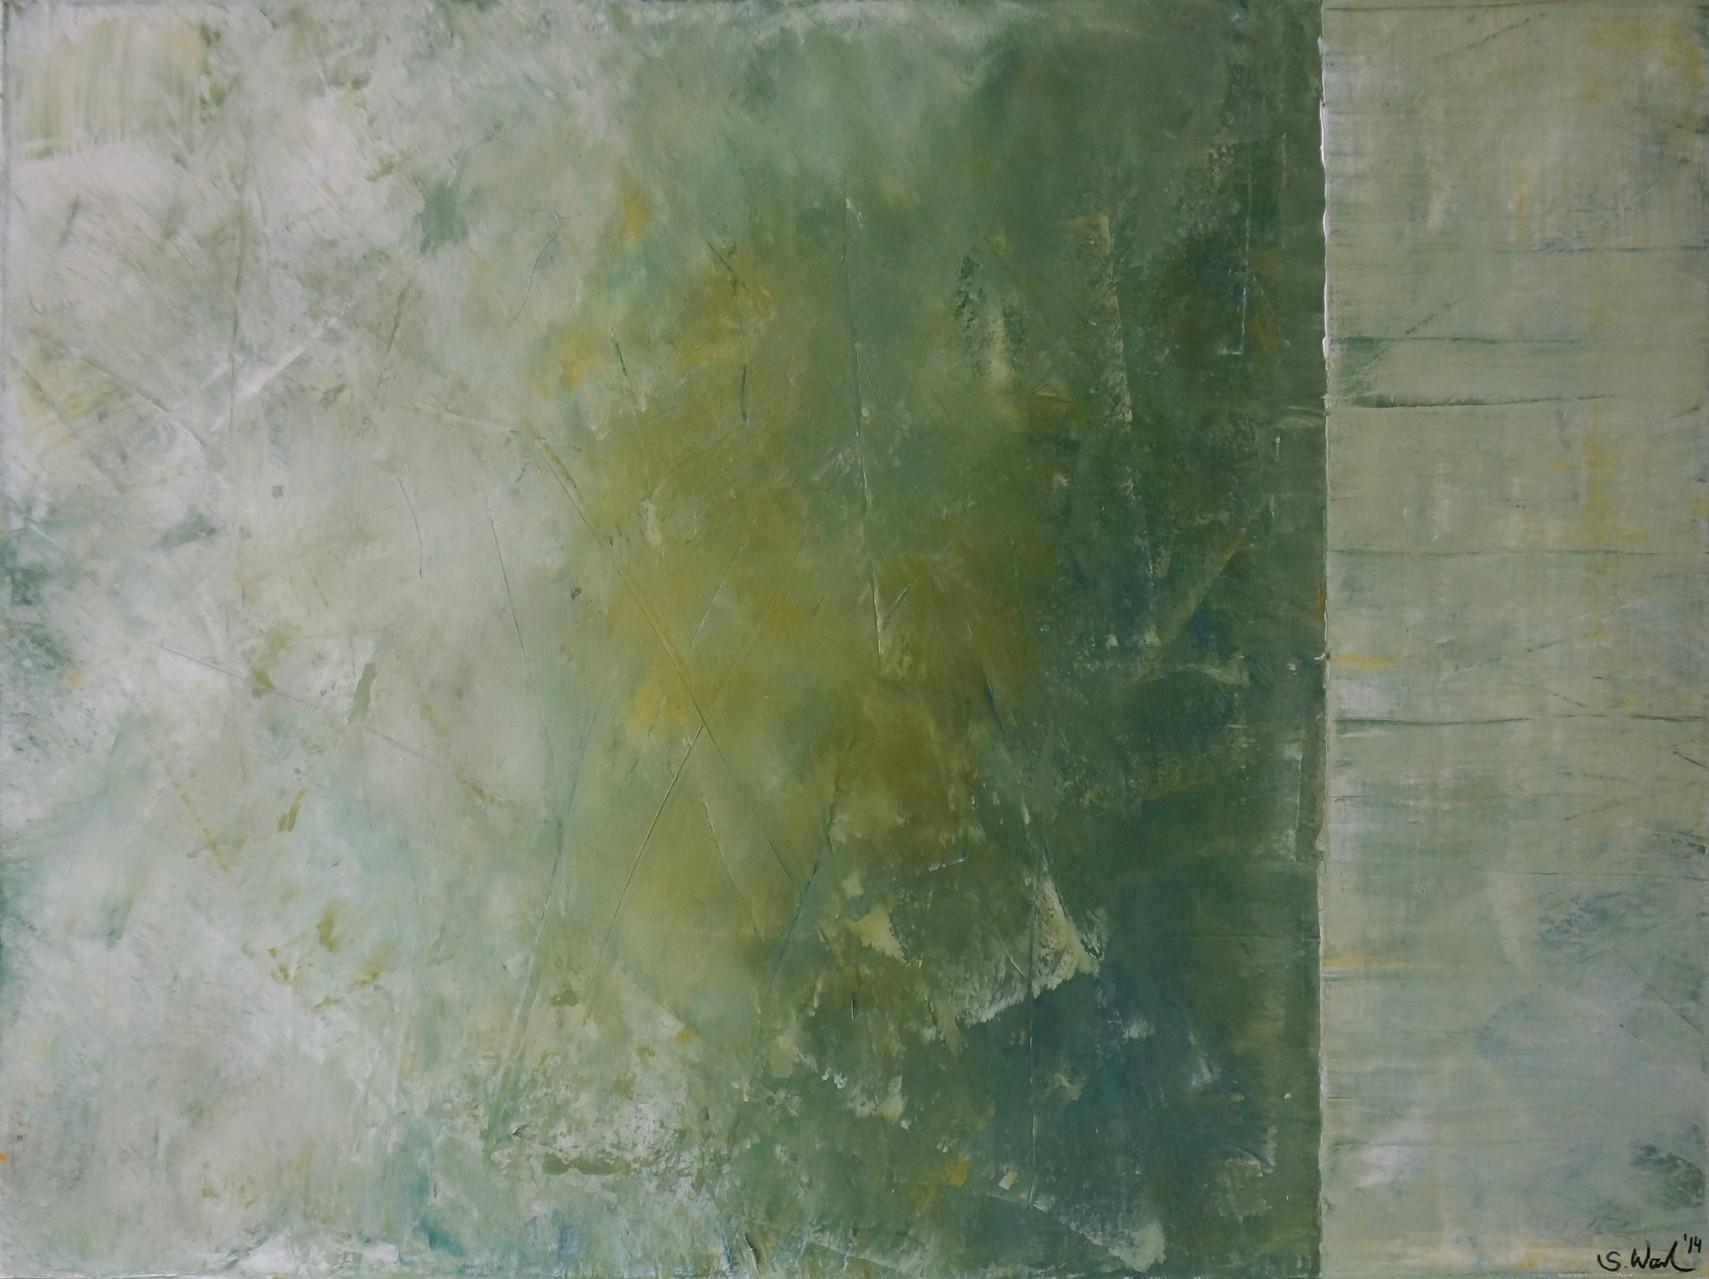 Acryl auf Leinwand, Spachteltechnik - 60x80